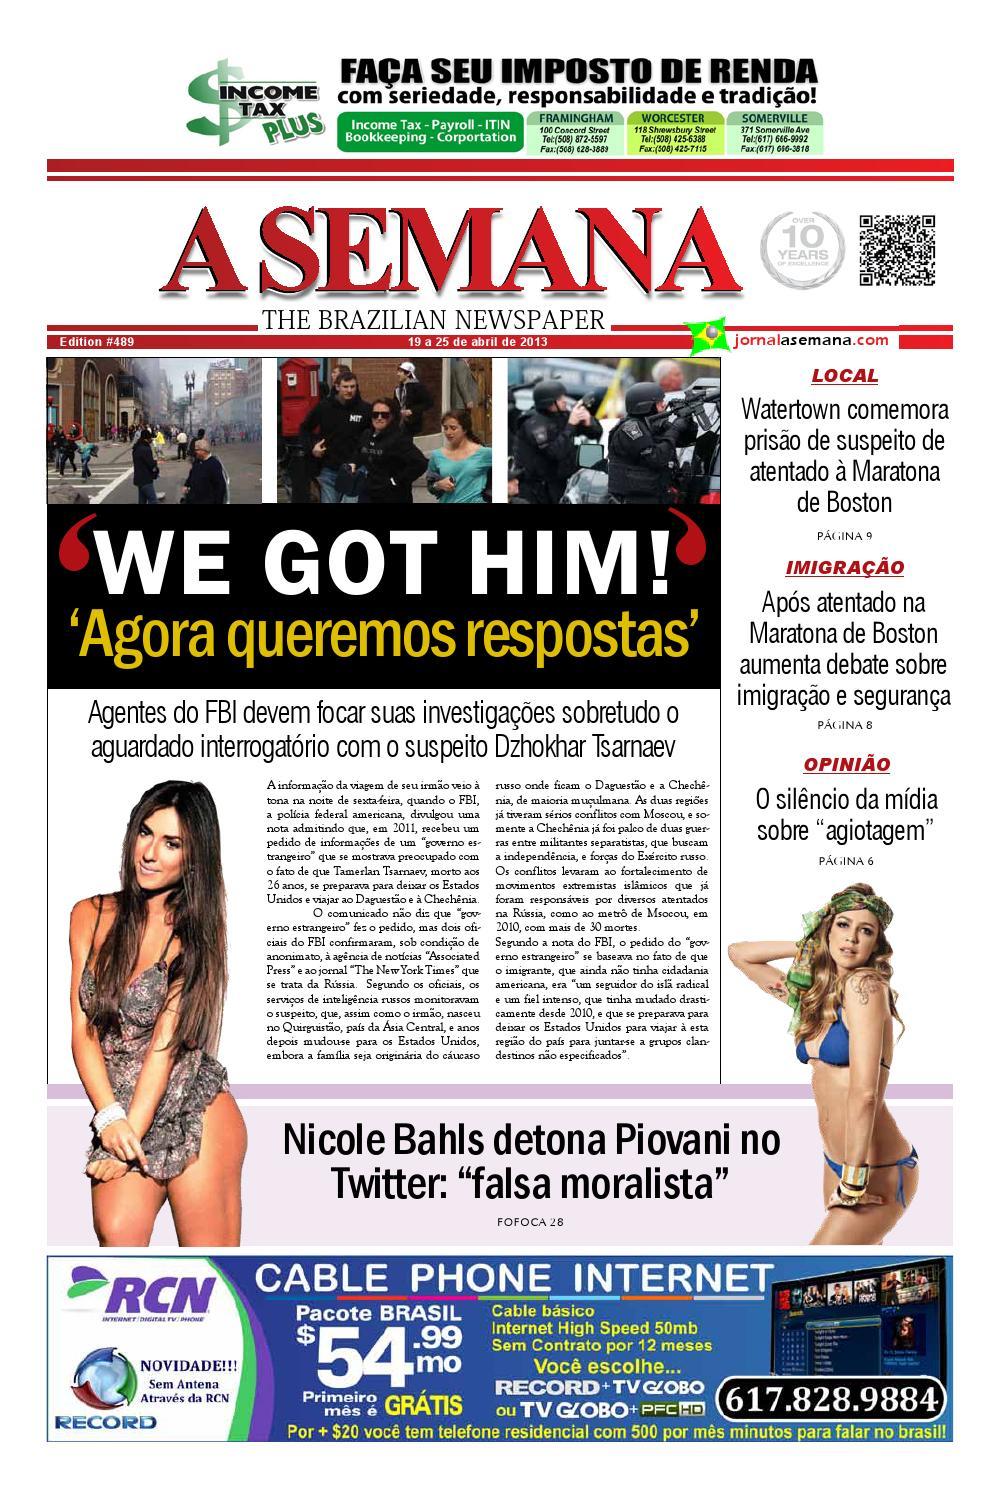 c6ebf0bb34c3a A SEMANA - The Brazilian Newspaper by JORNAL A SEMANA - issuu